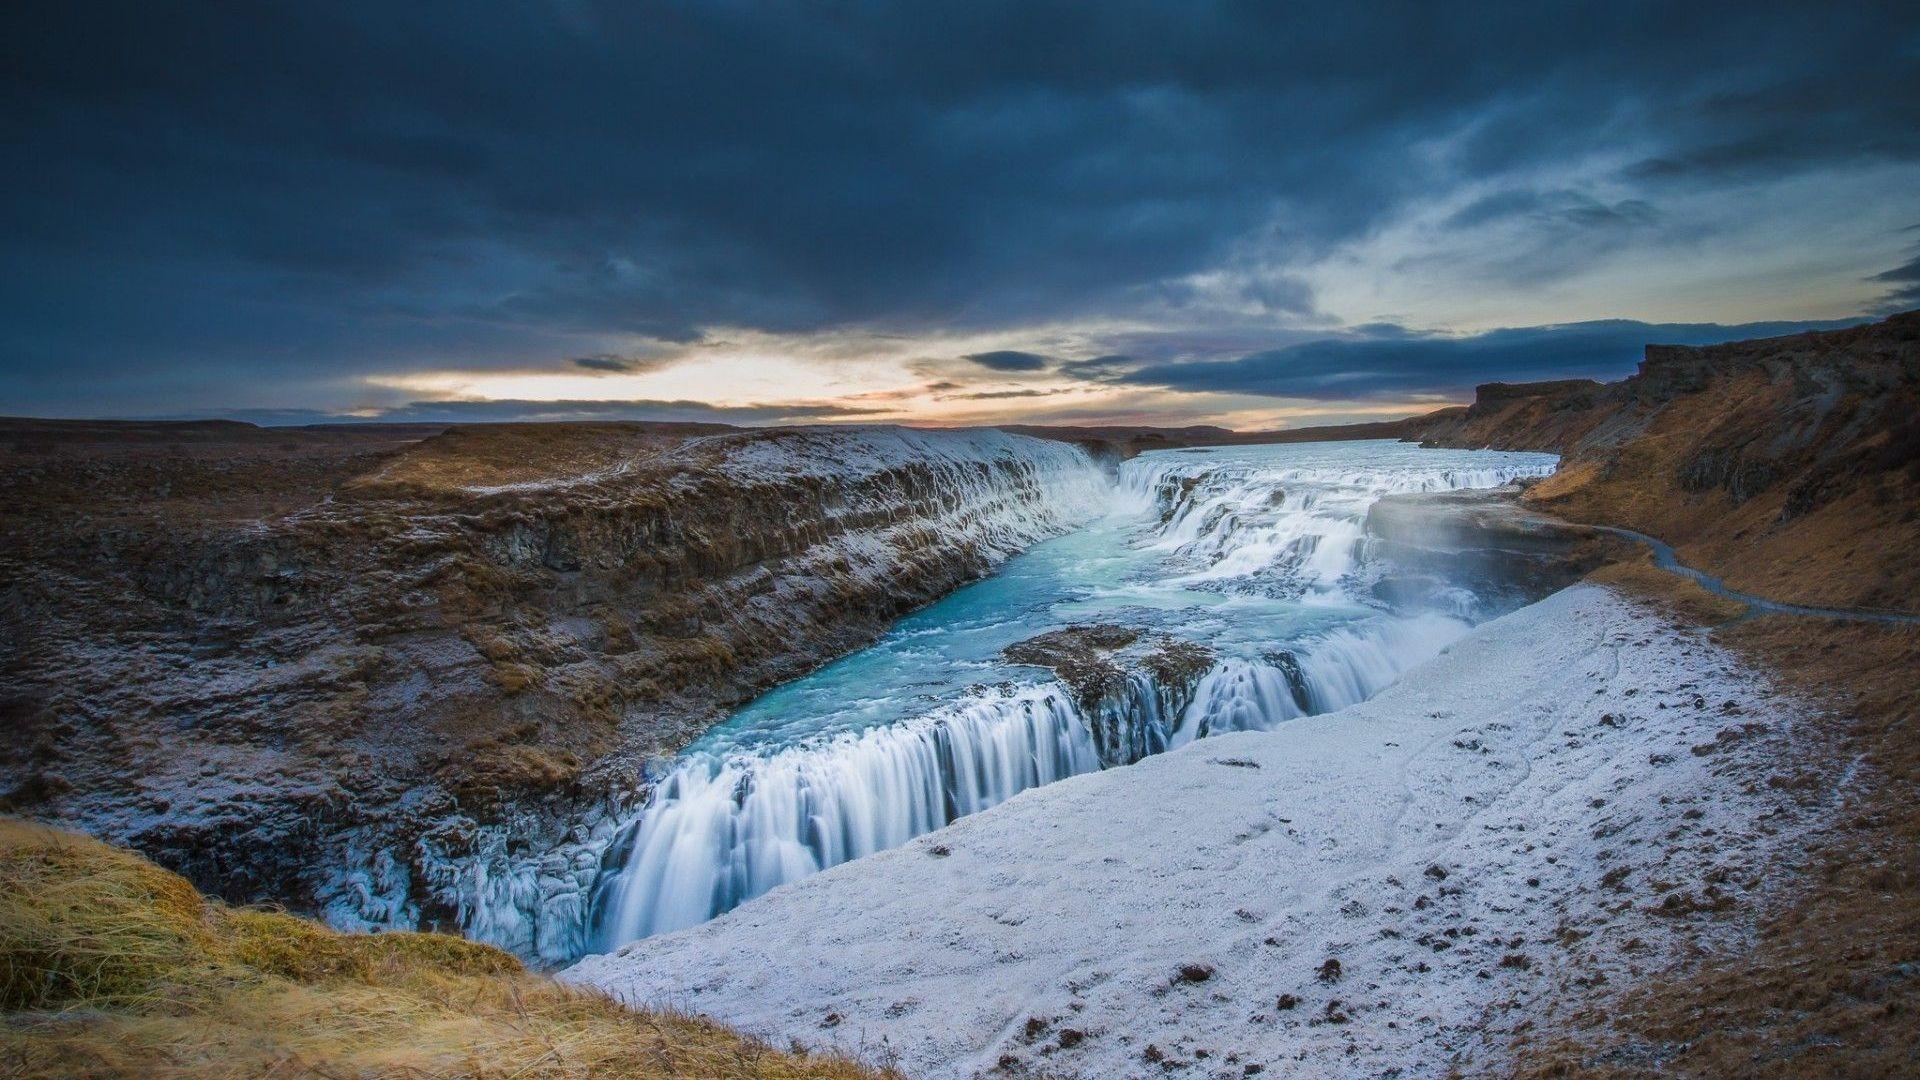 iceland wallpaper hd 12589